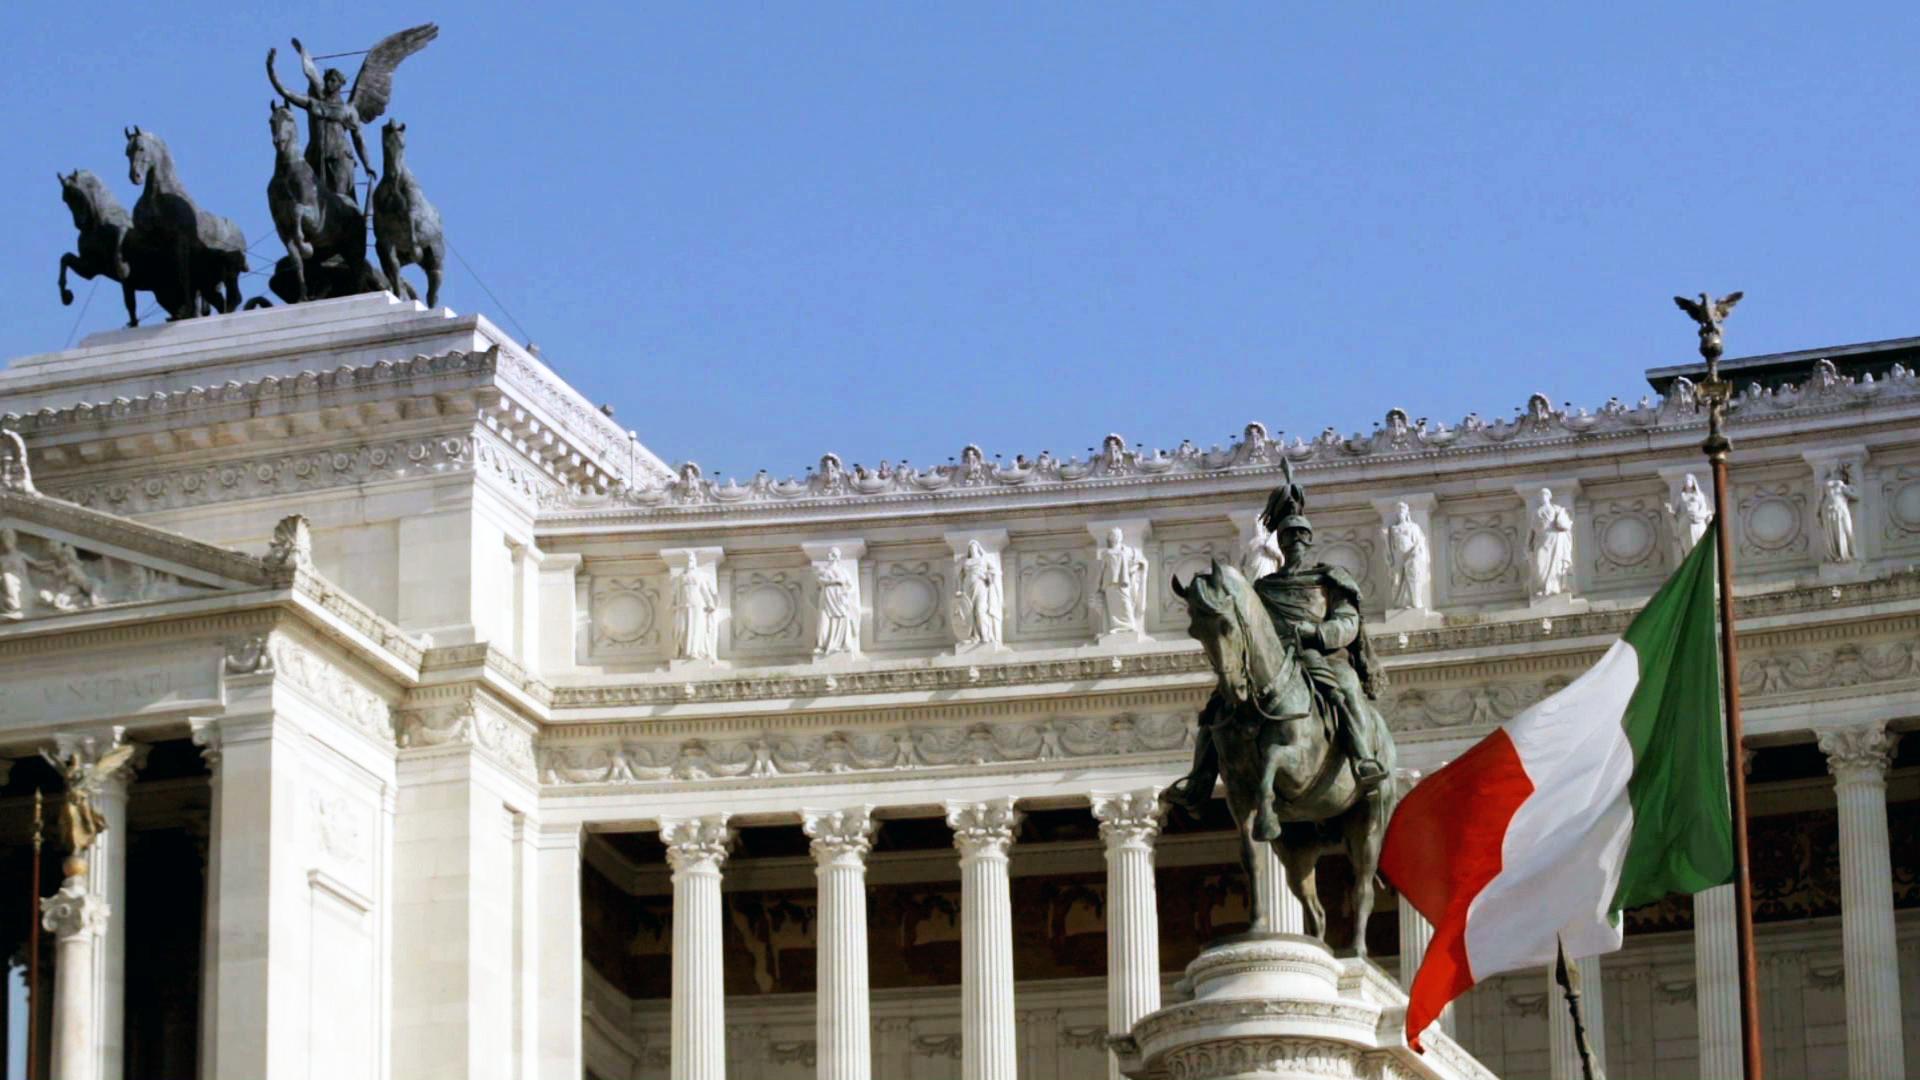 Season 4 Episode 3: Rome